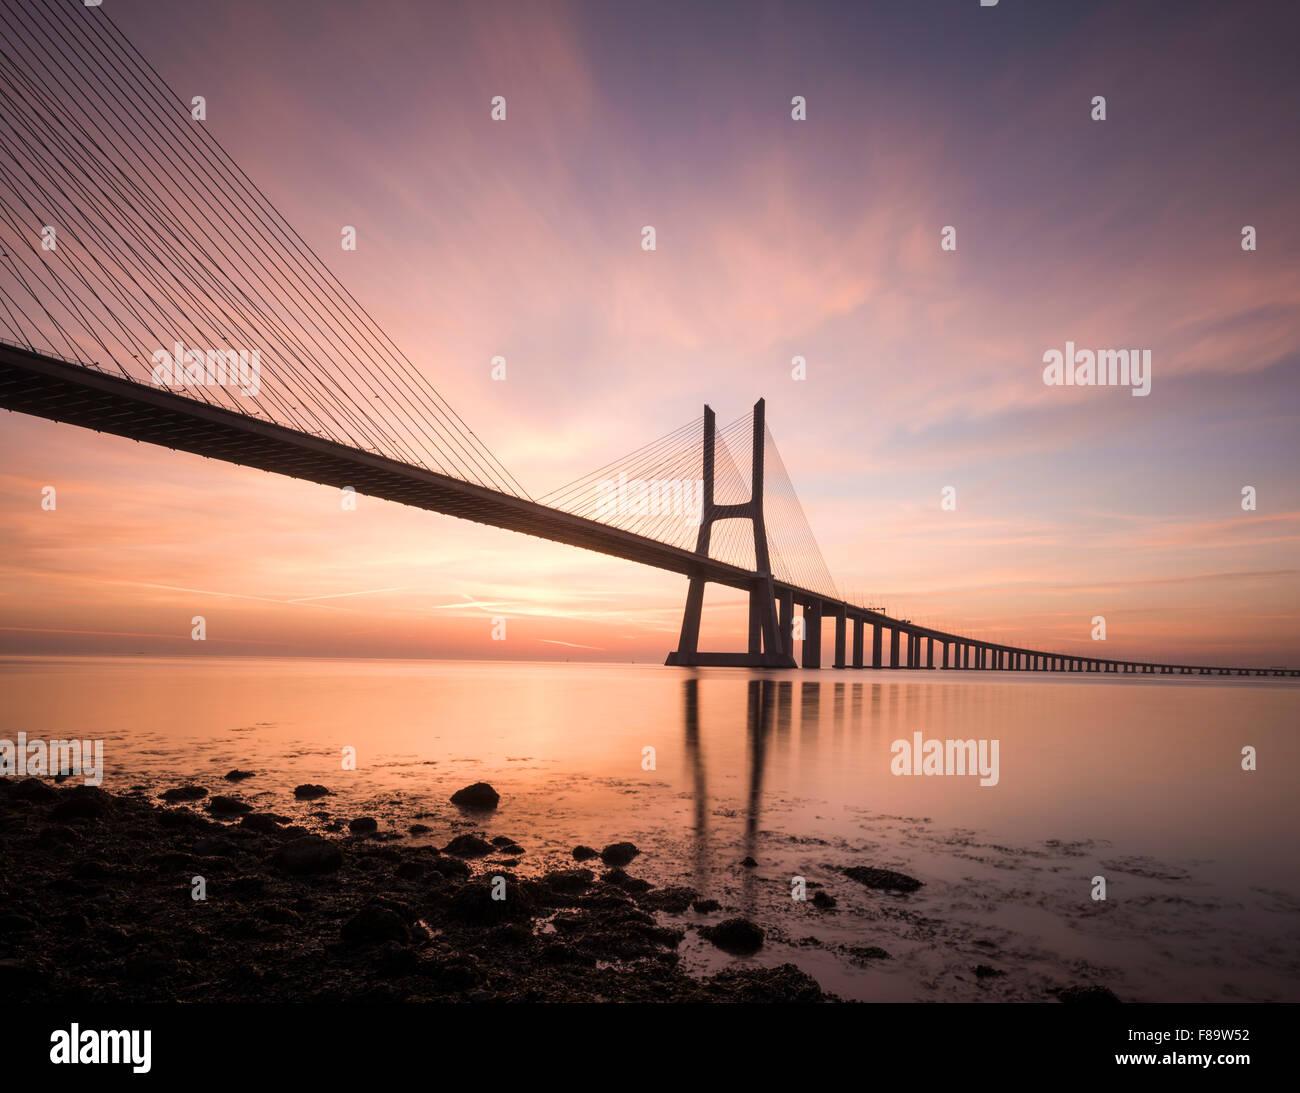 Vasco da Gama Bridge at dawn, Lisbon, Portugal - Stock Image